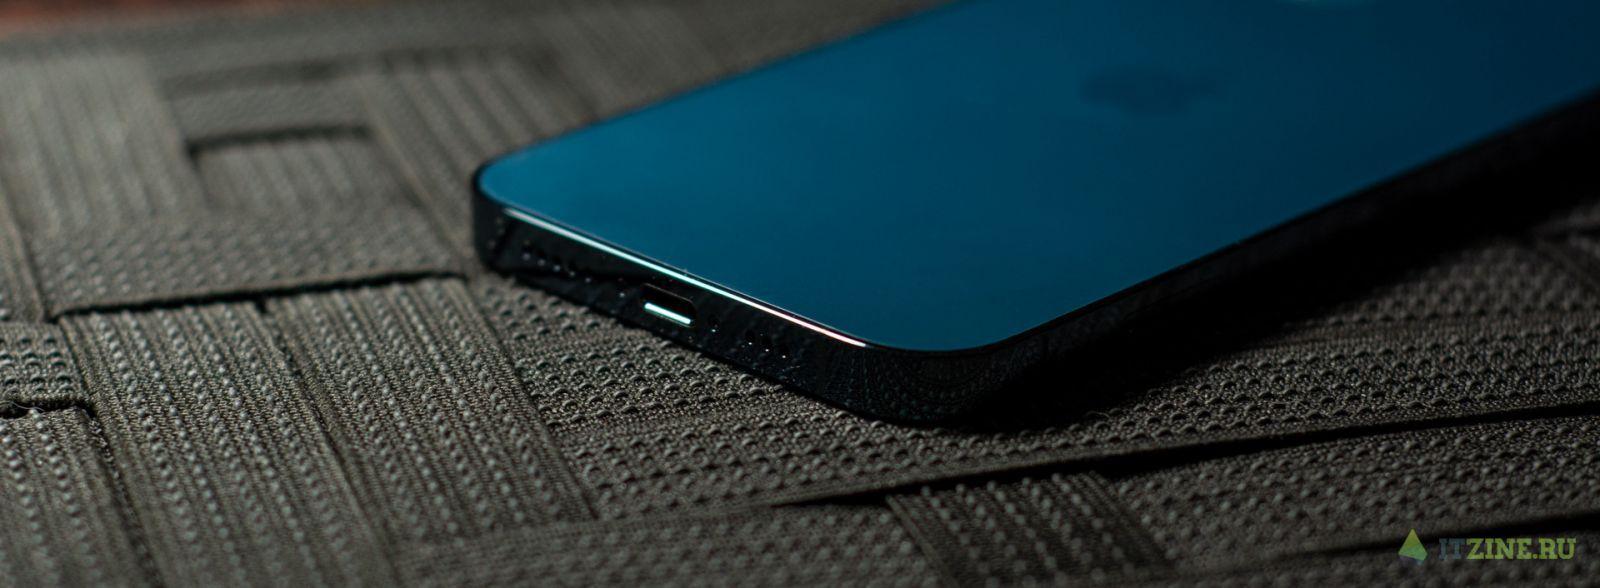 Lightning в iPhone 12 Pro